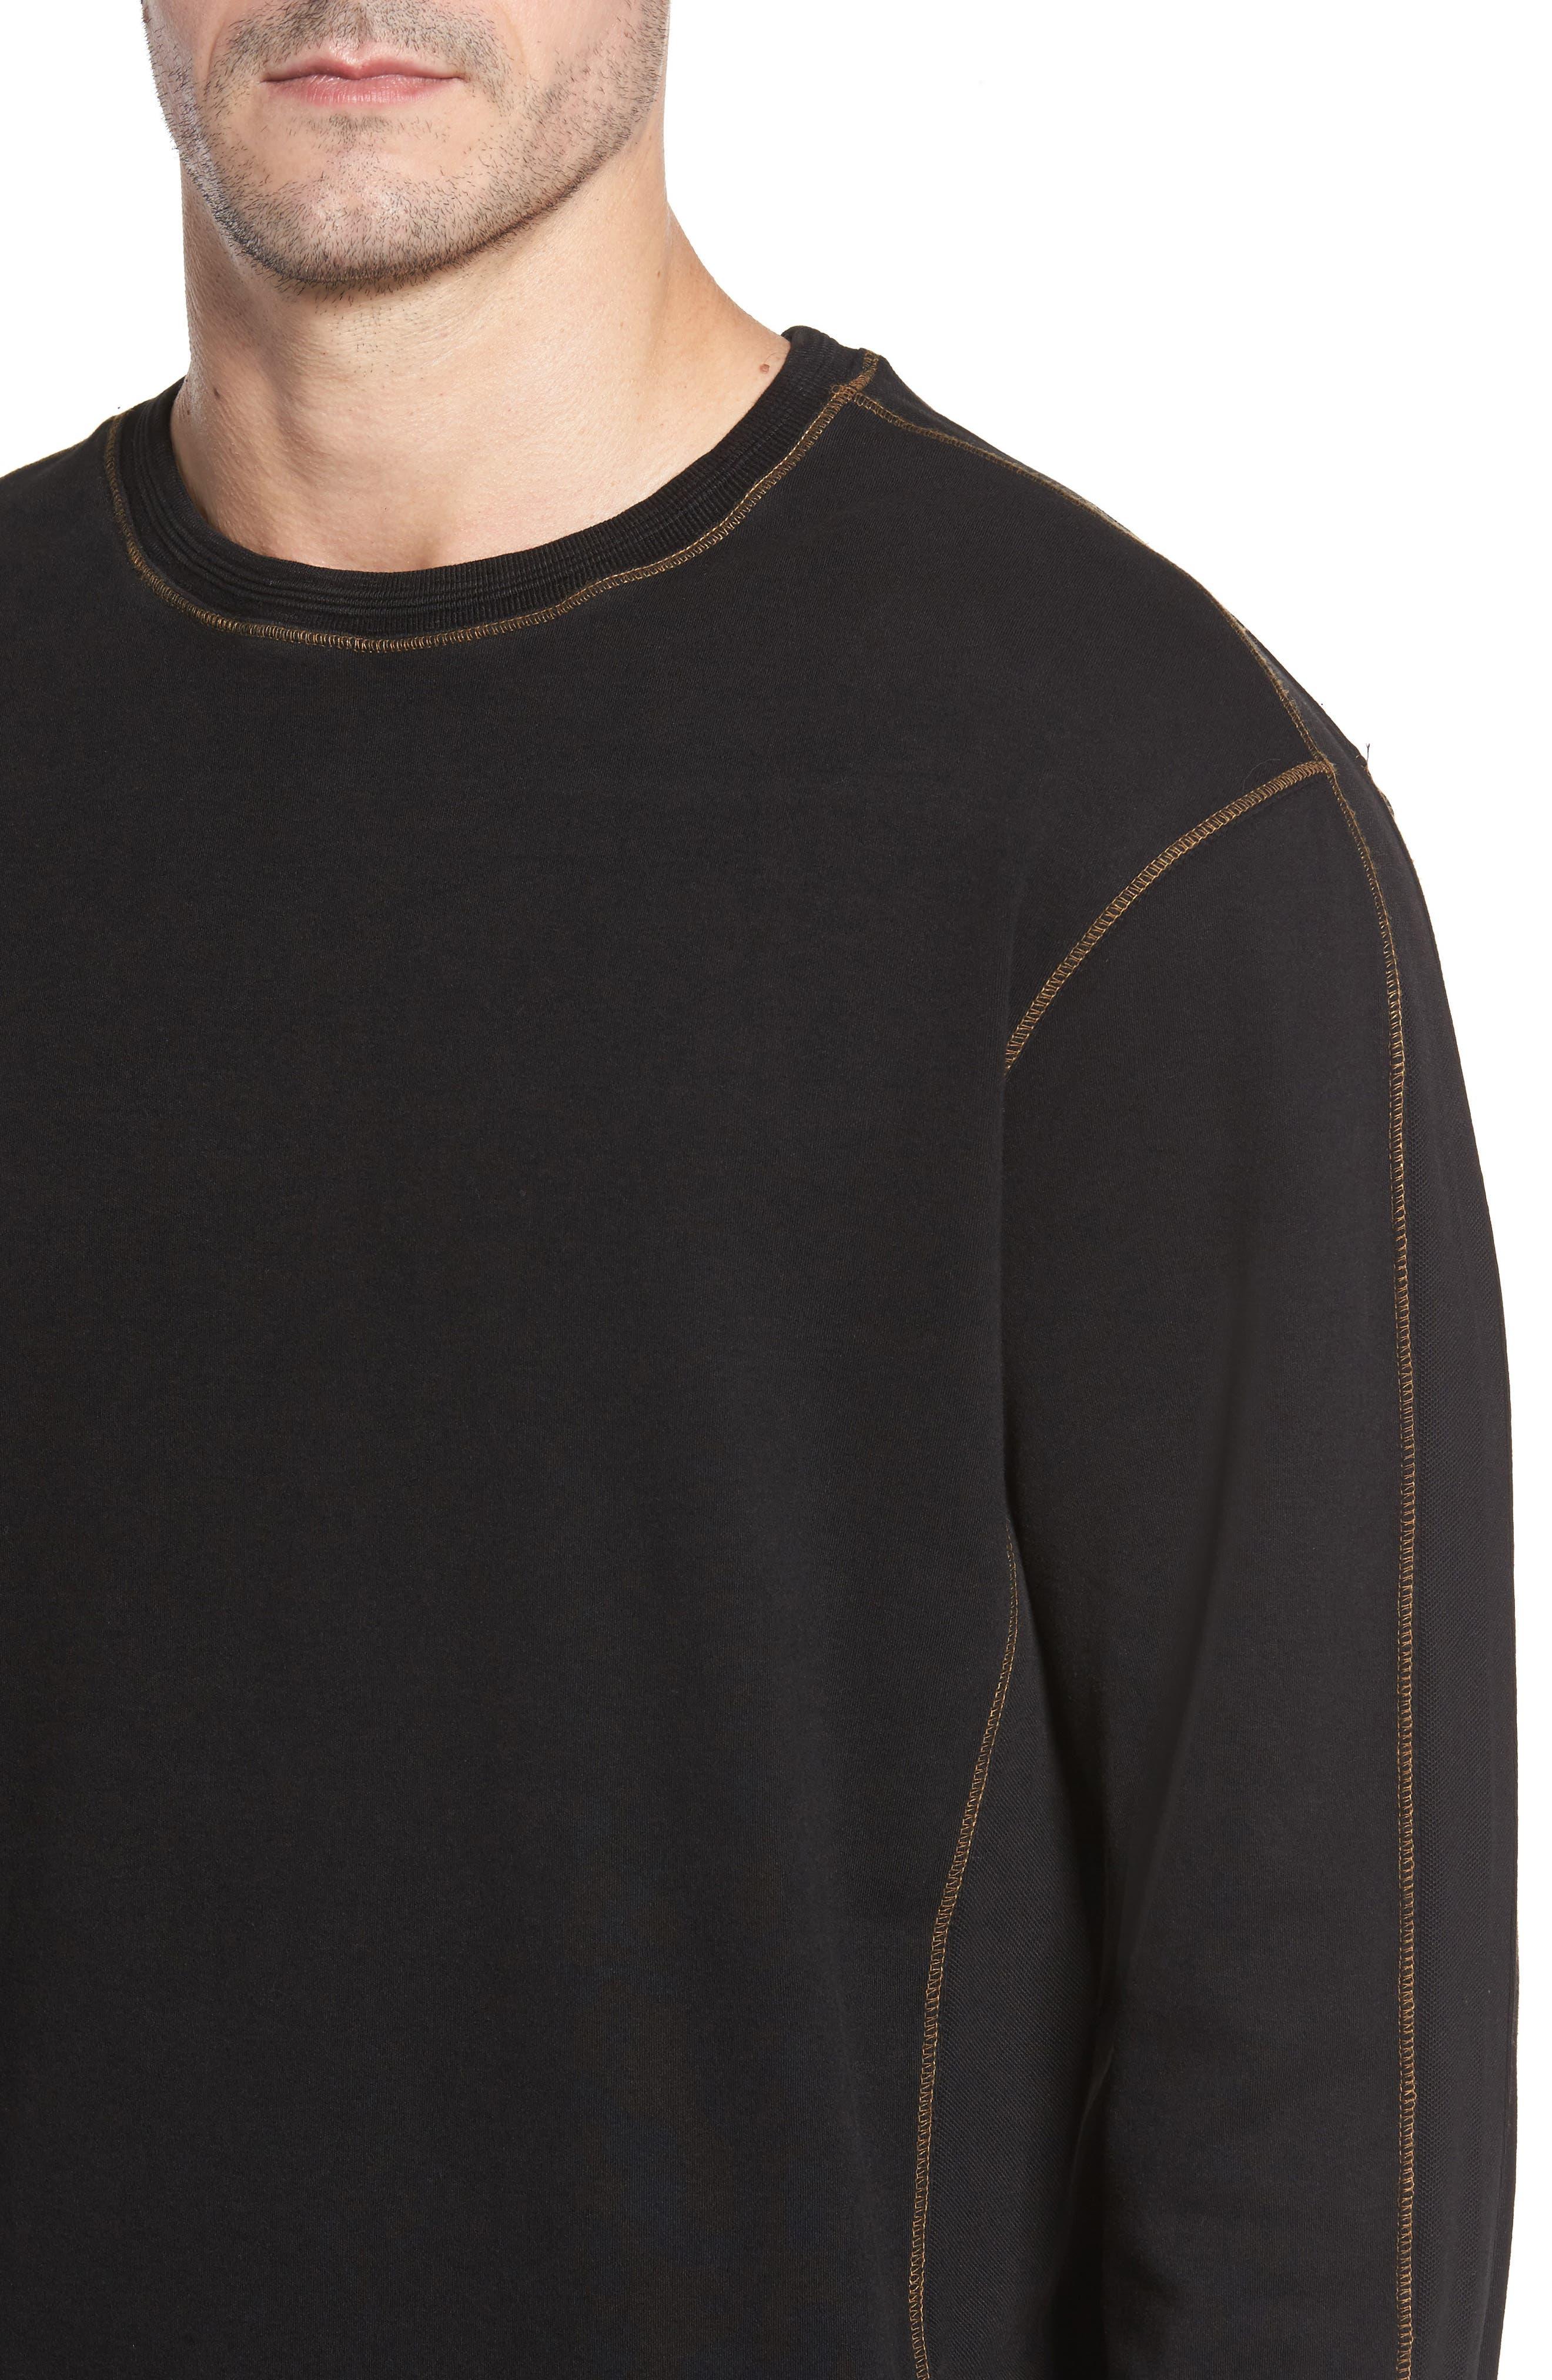 Kenyon Long Sleeve T-Shirt,                             Alternate thumbnail 4, color,                             001